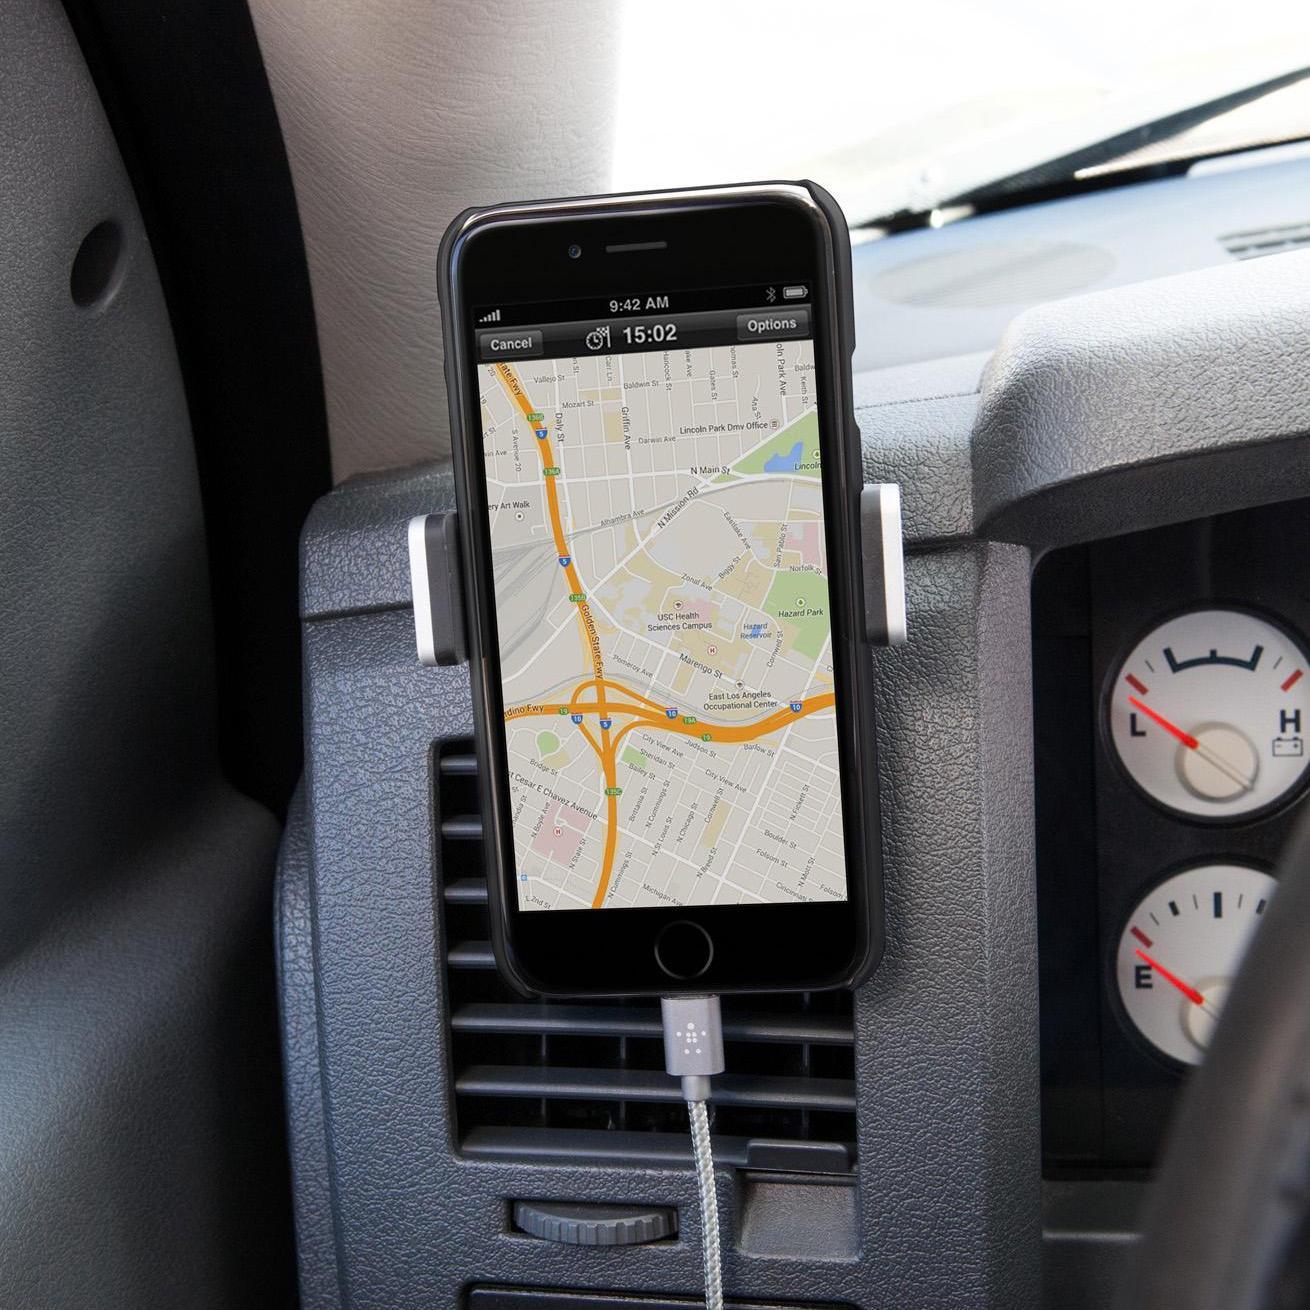 Portable universal adjustable car air vent mount holder 3